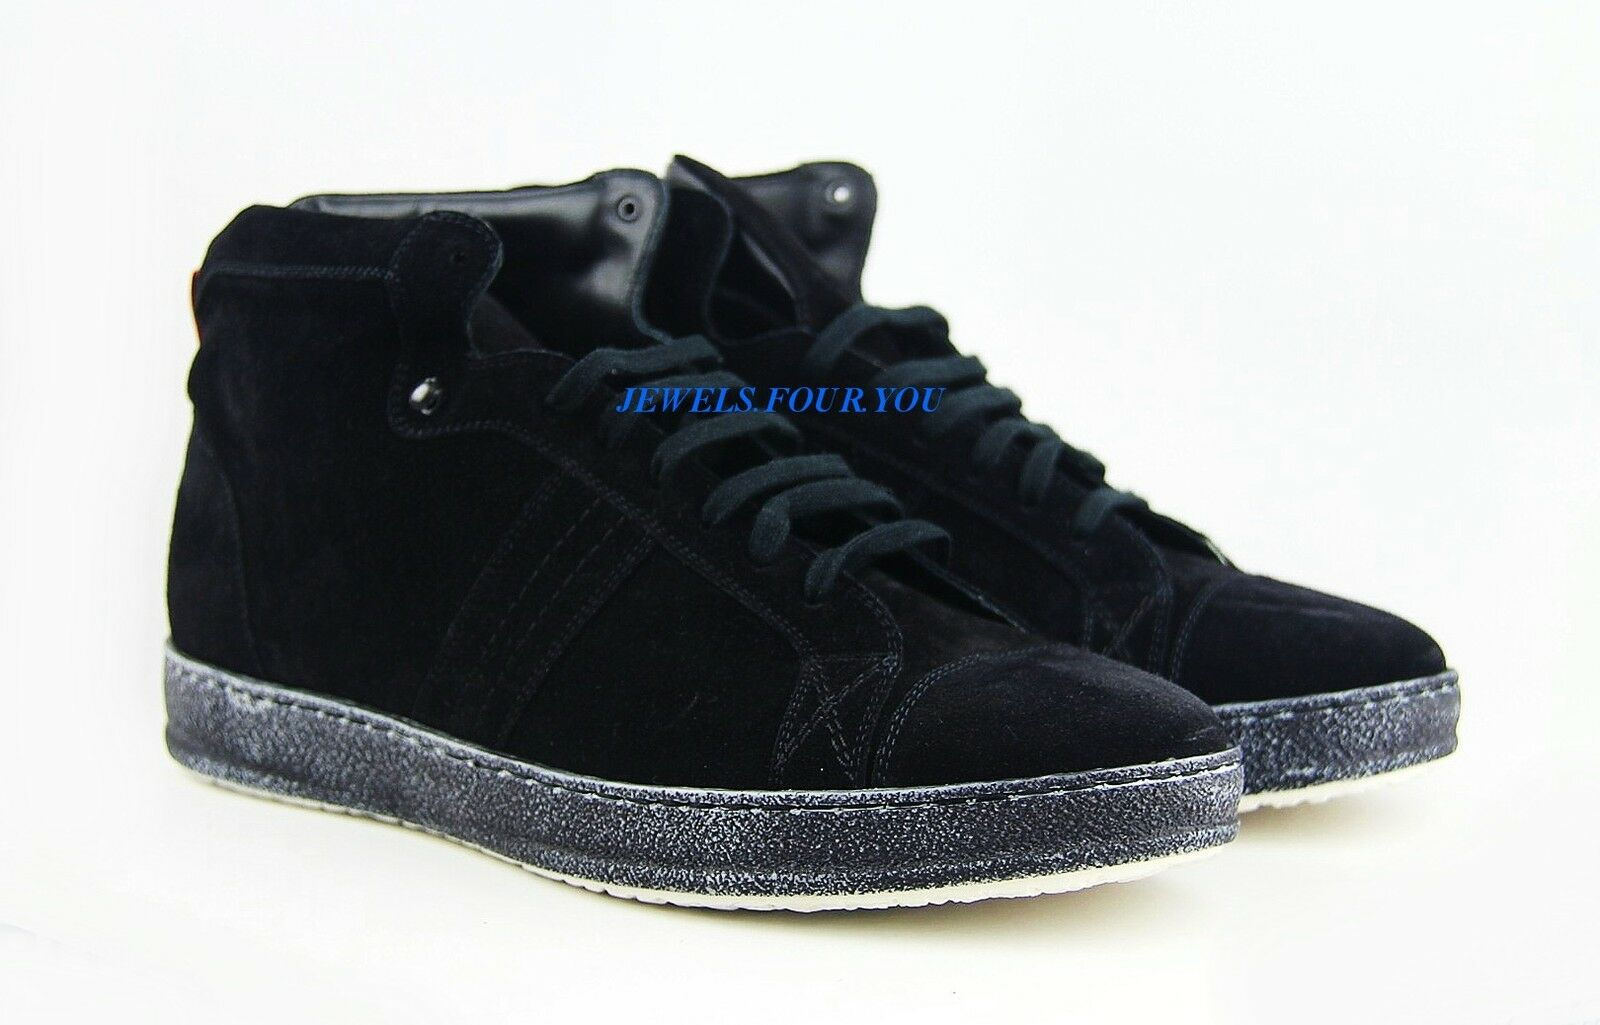 Kiton Hecho a Mano botas Zapatos Negro Gamuza Cuero 100% Italia Nuevo